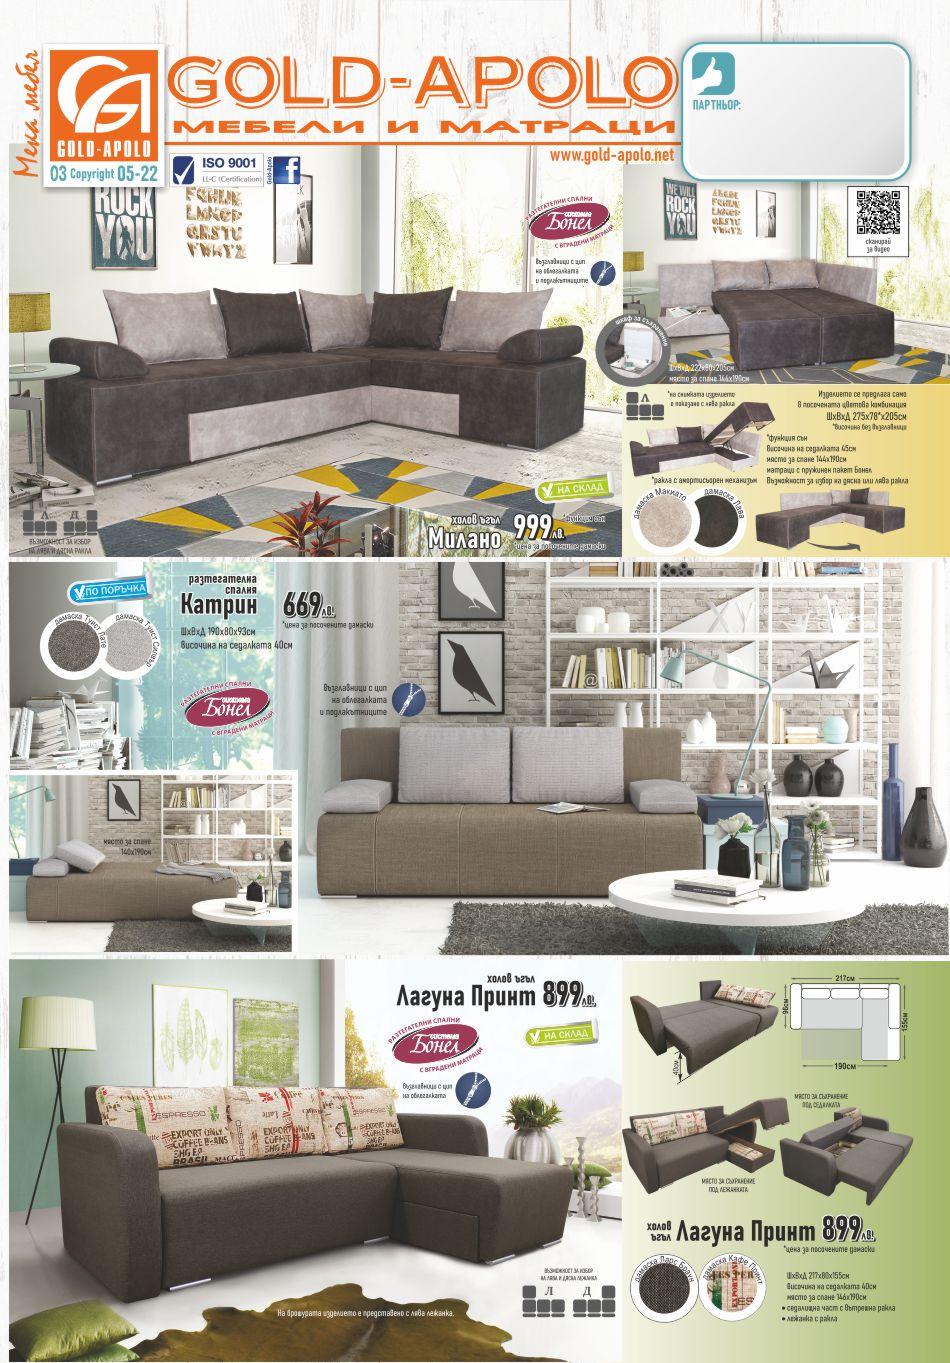 b_sofas_p1.jpg